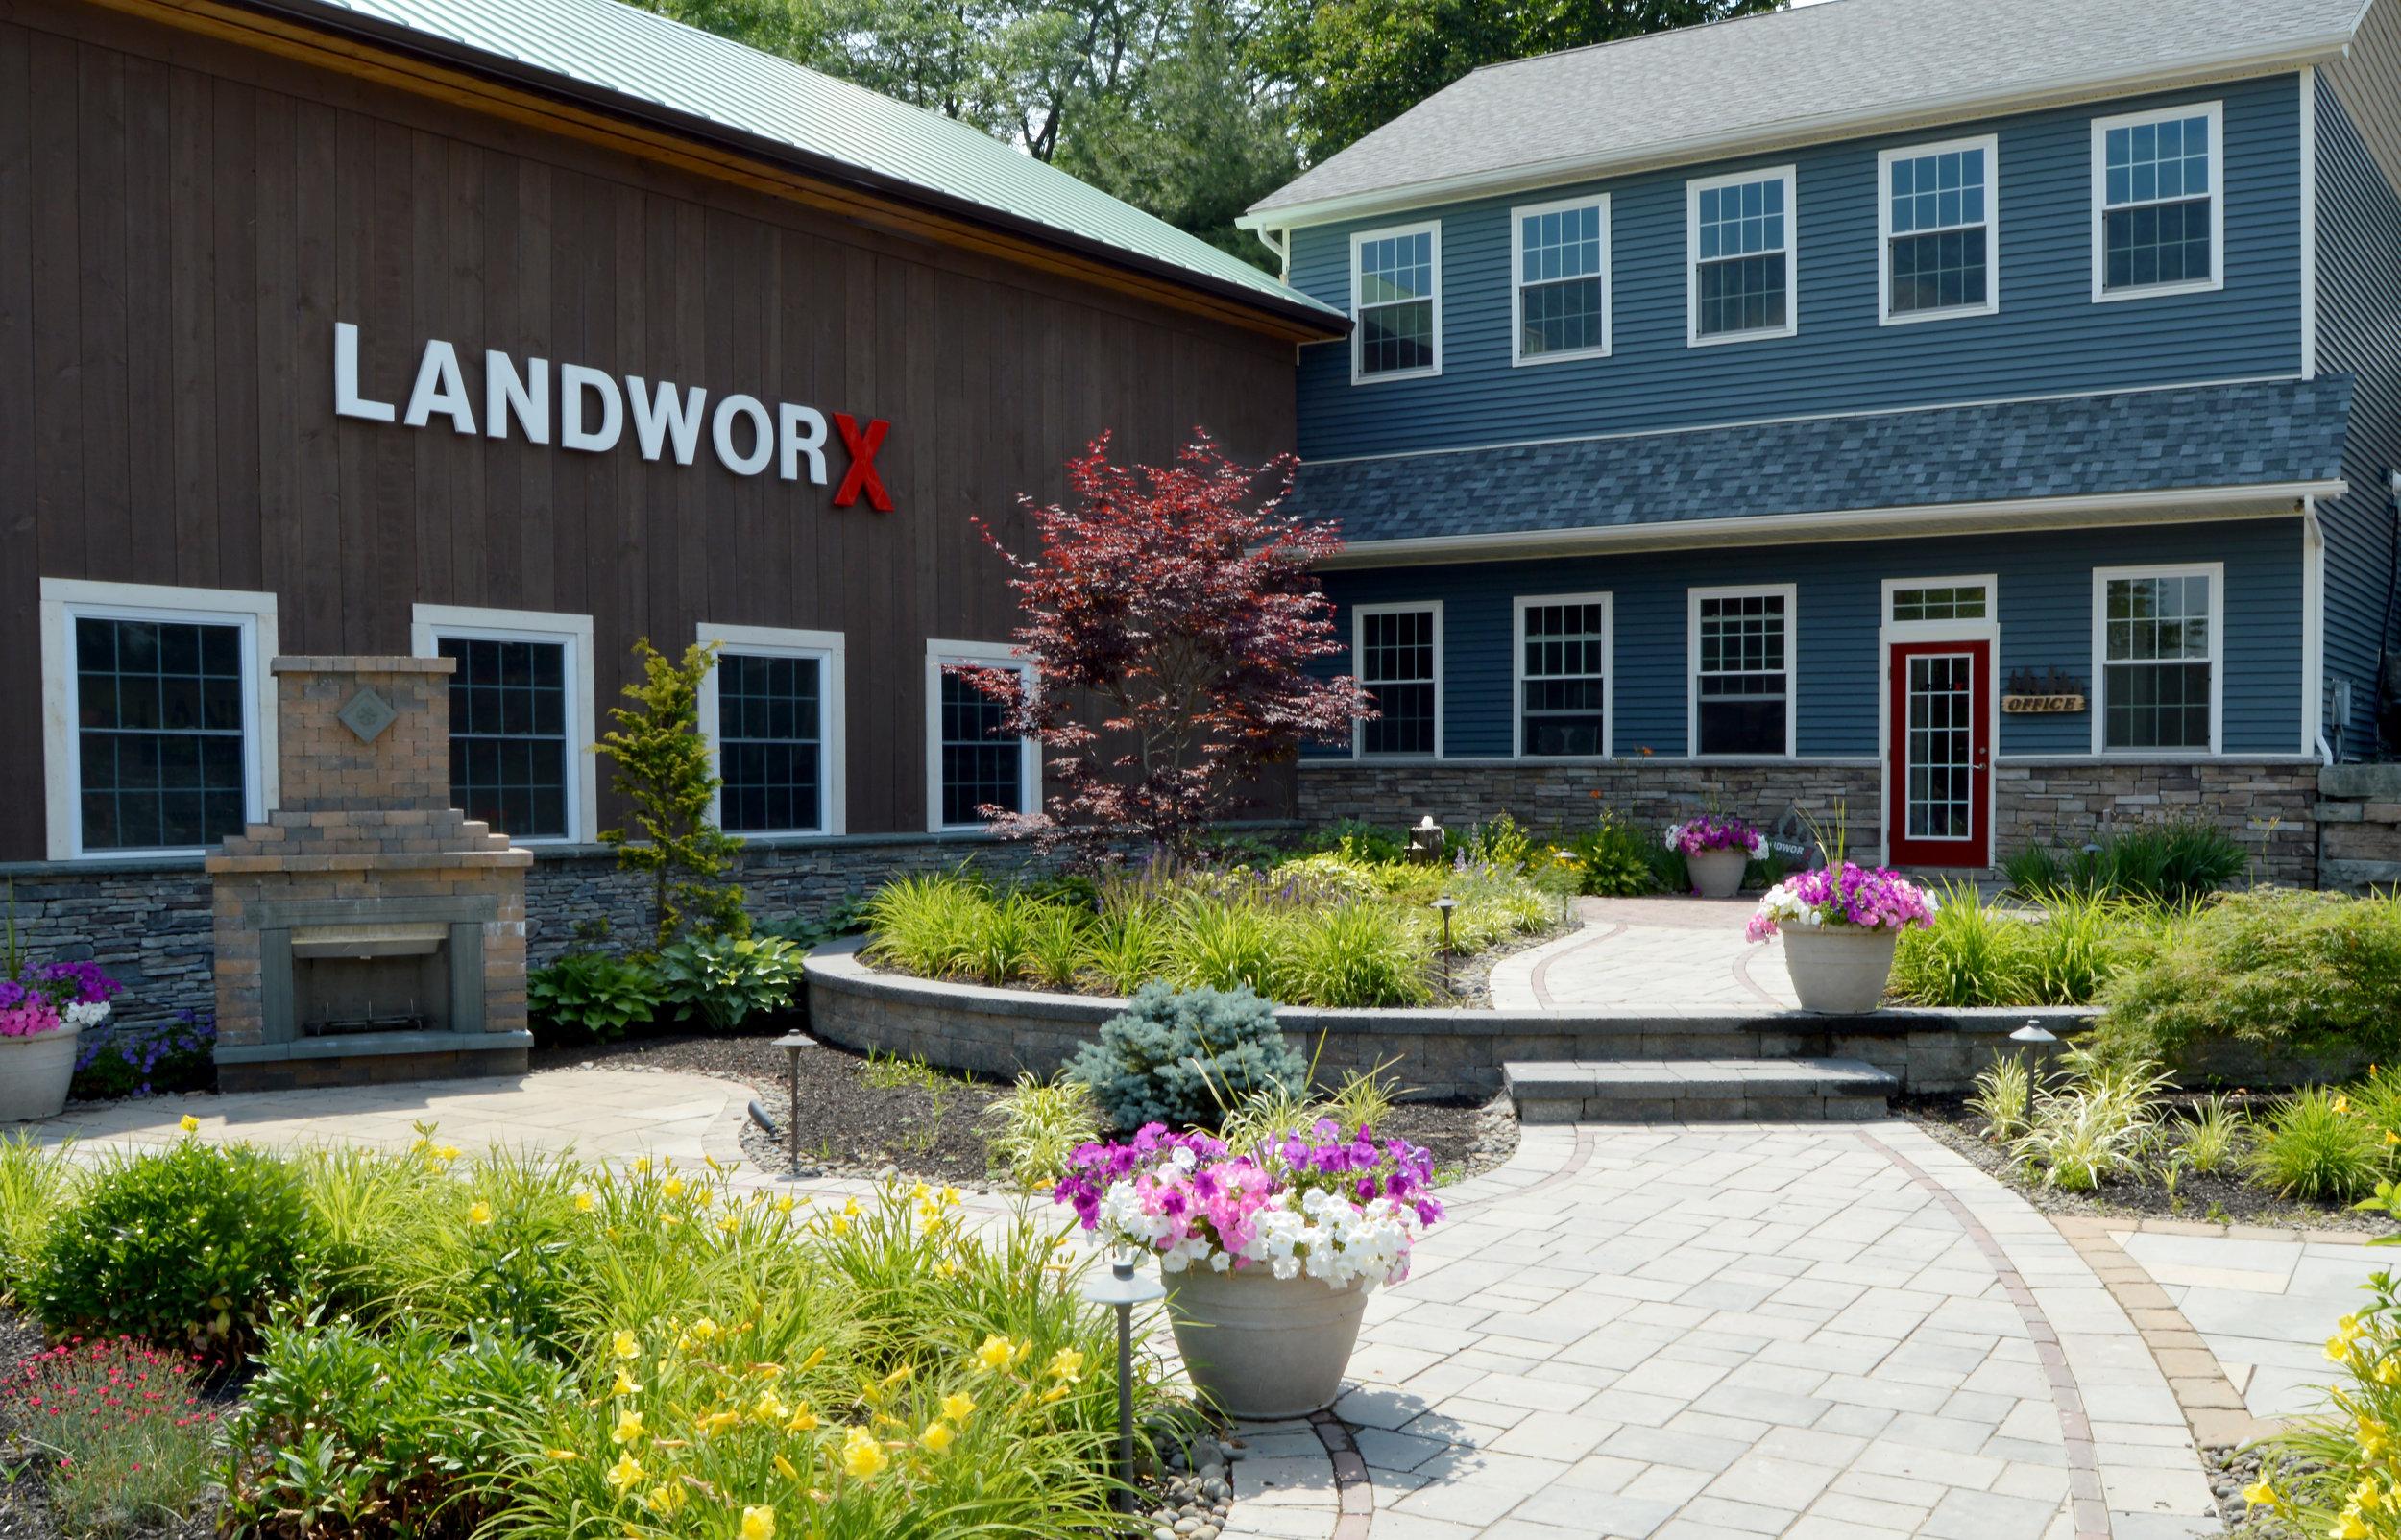 Landworx Landscaping in Goshen, NY